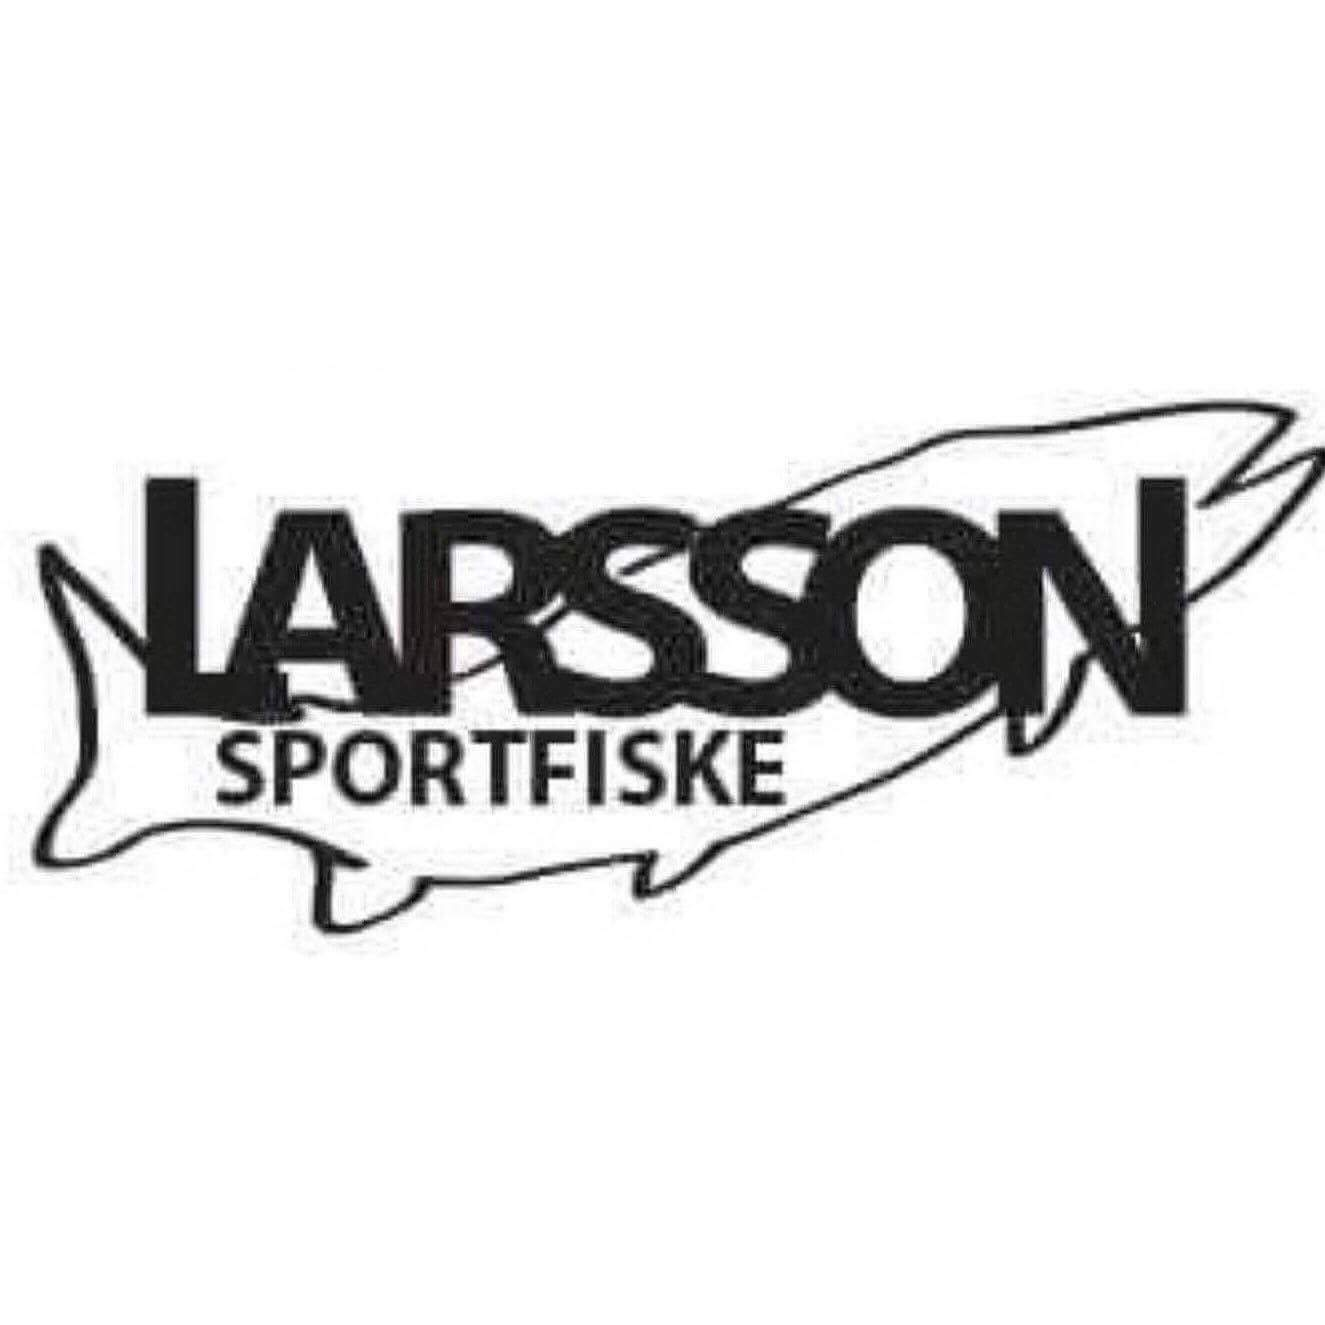 Larsson Sportfiske